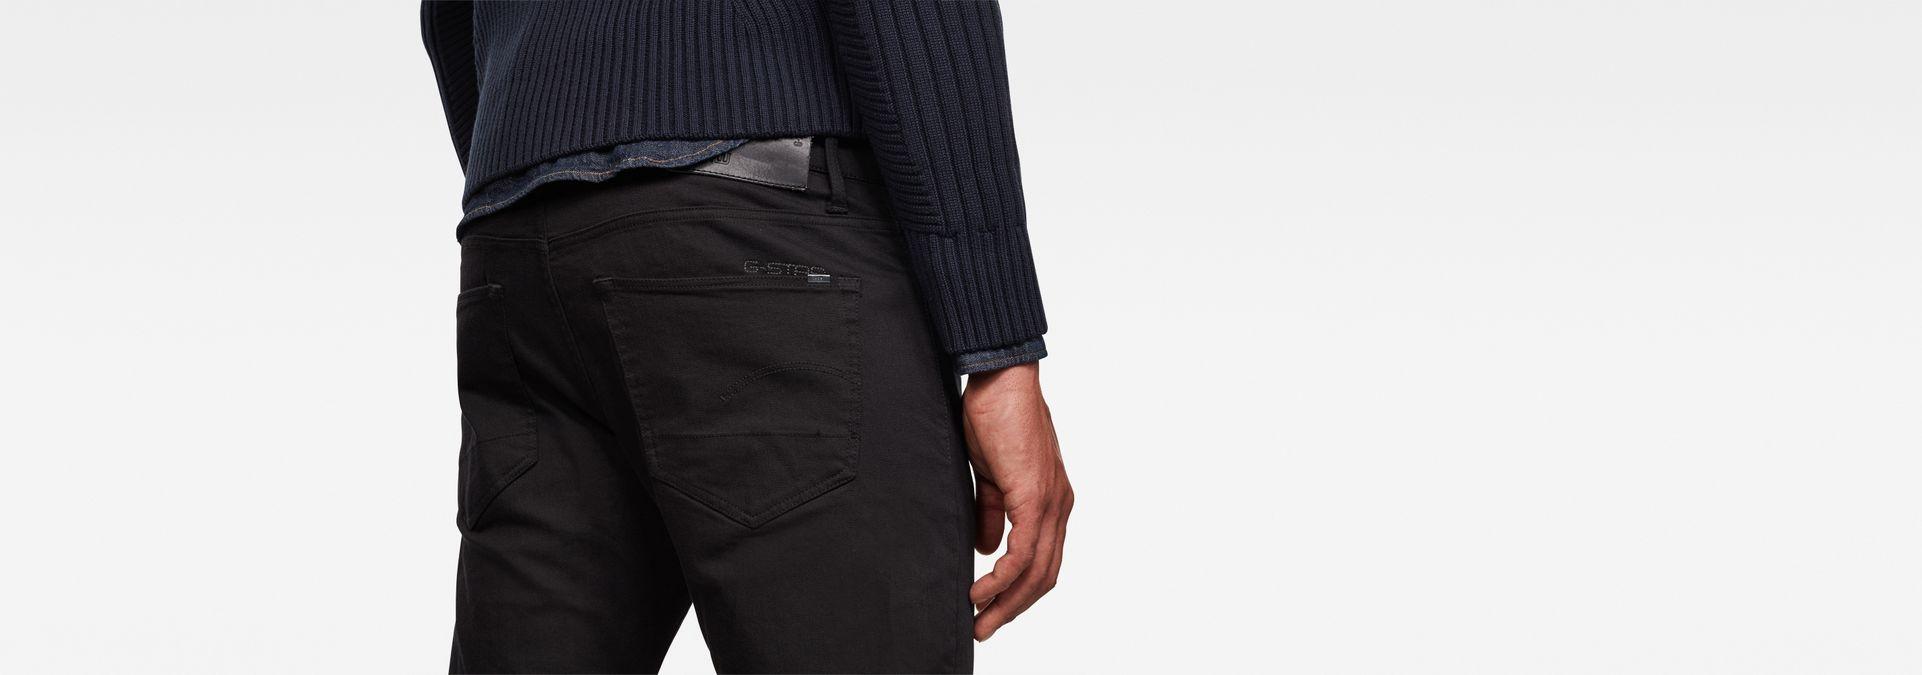 e1ce54c83a46 ... G-Star RAW® 3301 Slim Jeans Black ...